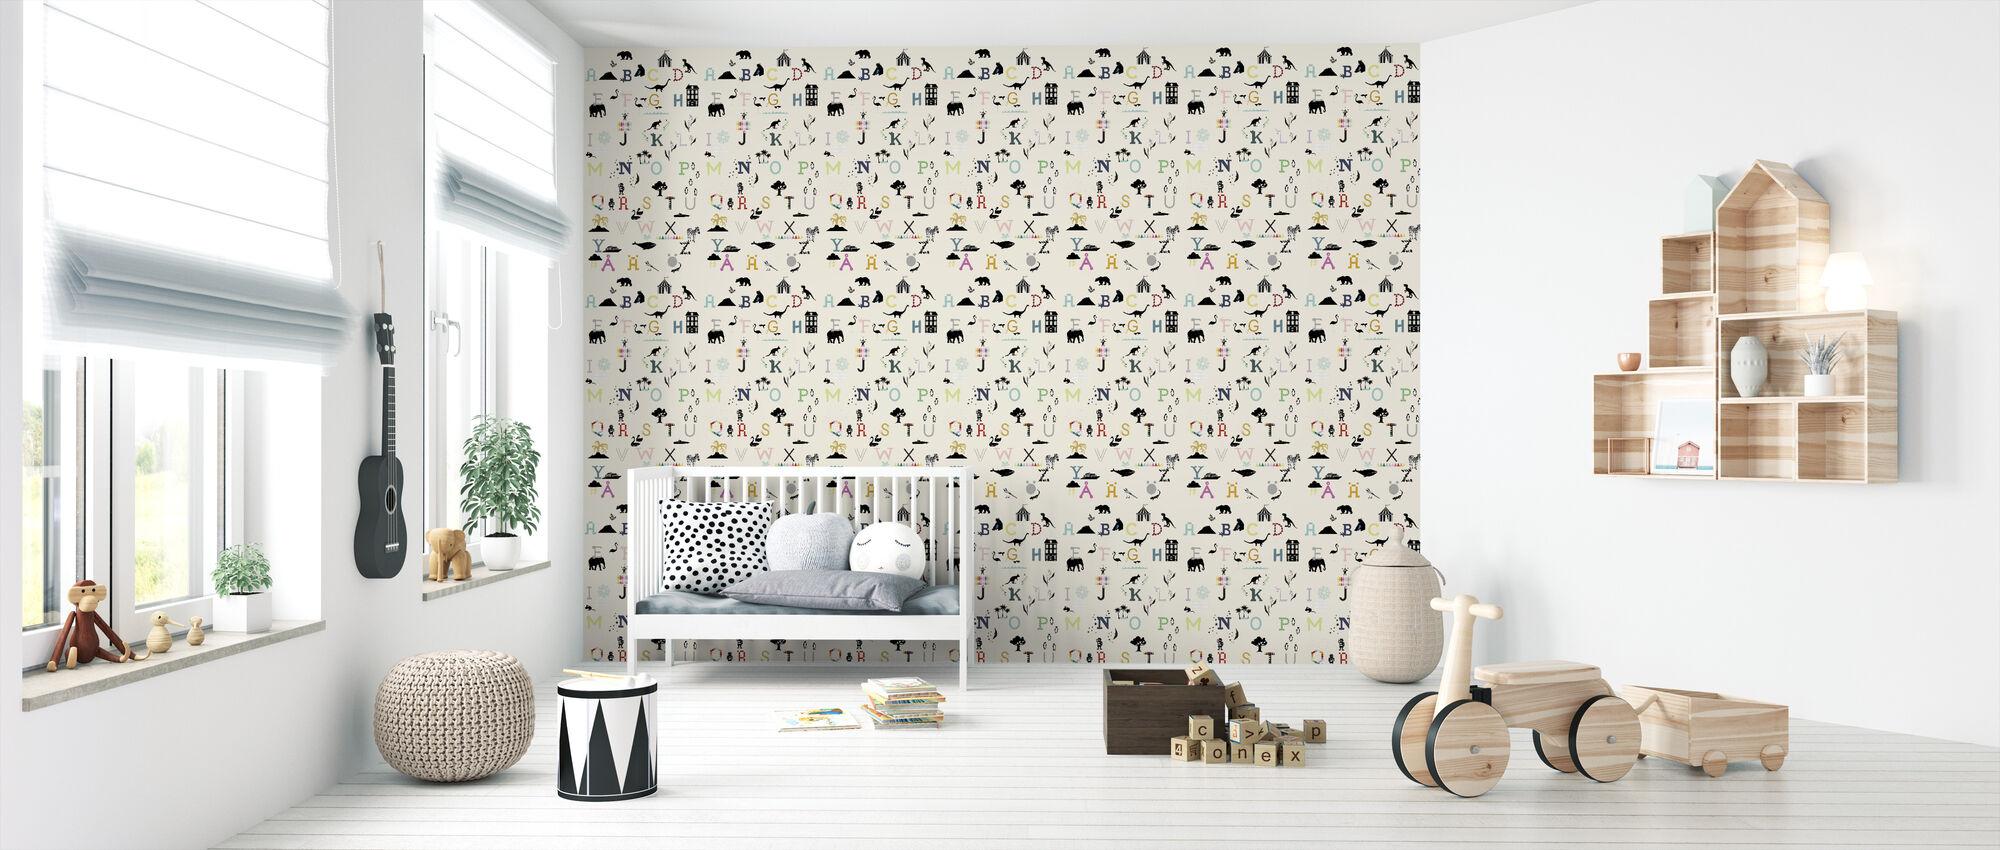 ABC wall - Wallpaper - Nursery